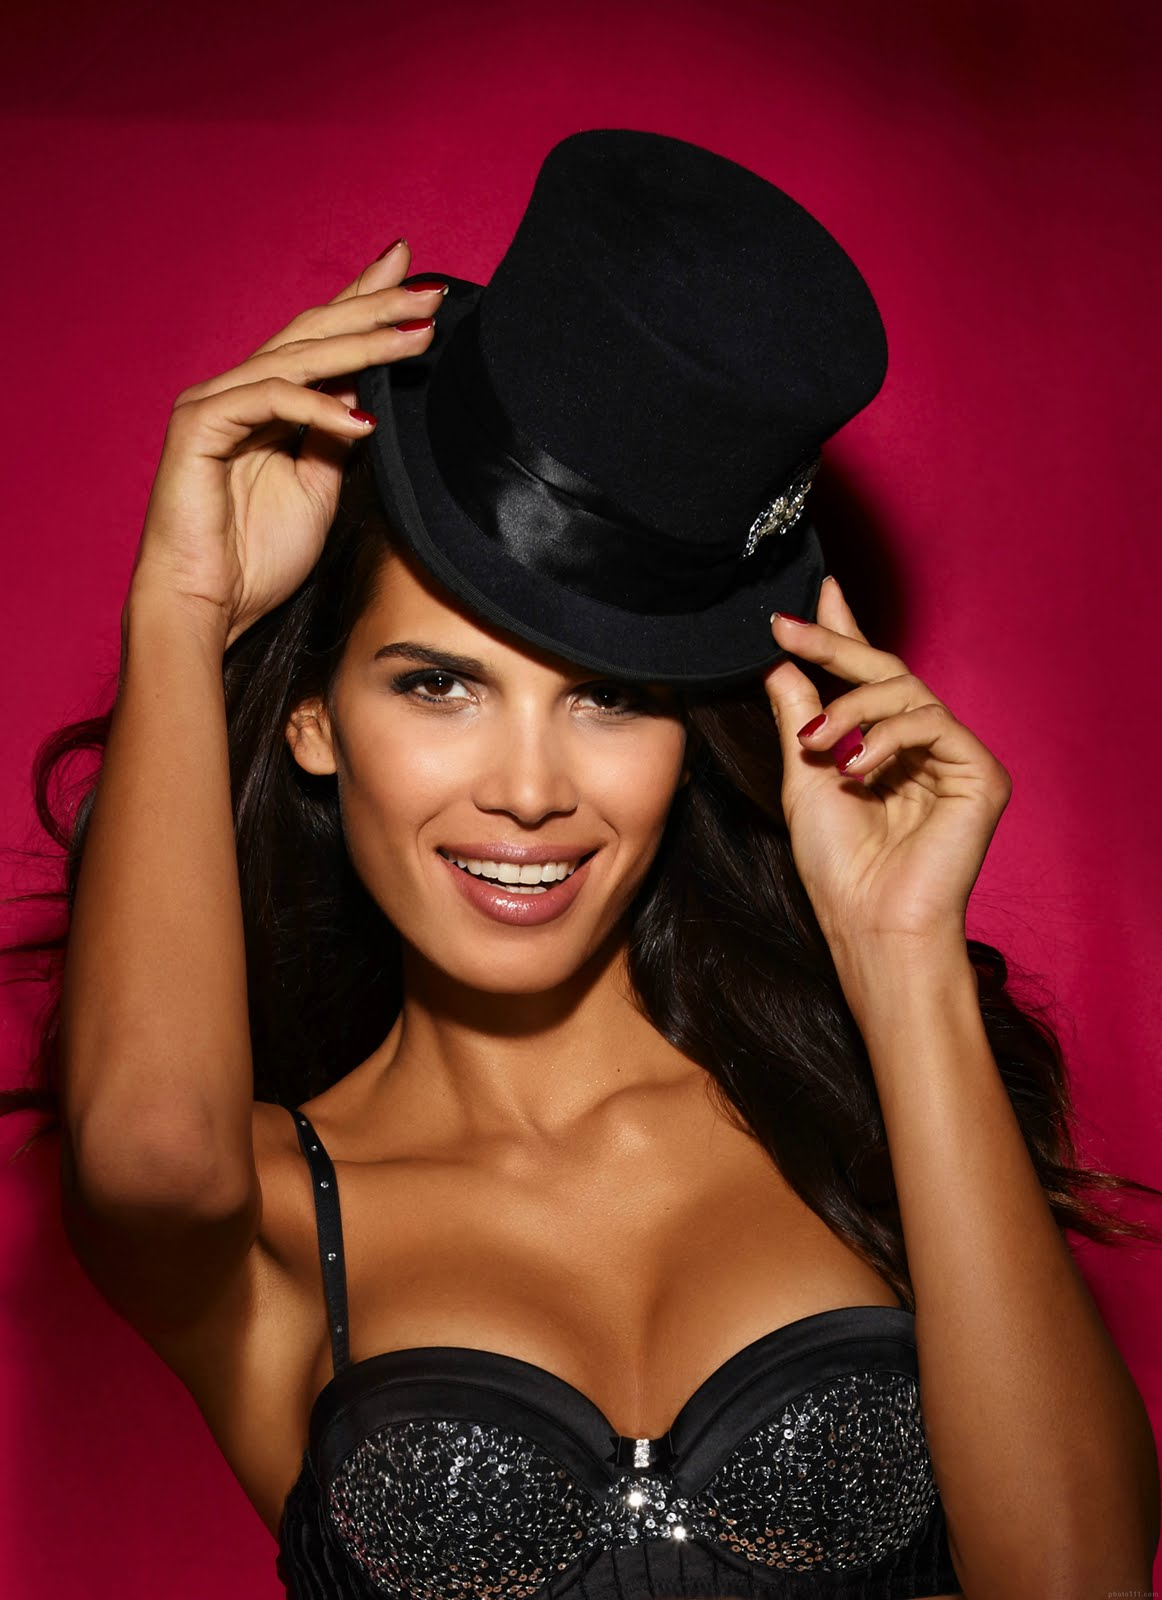 Brazil Model Raica Oliveira Girls Idols Wallpapers And